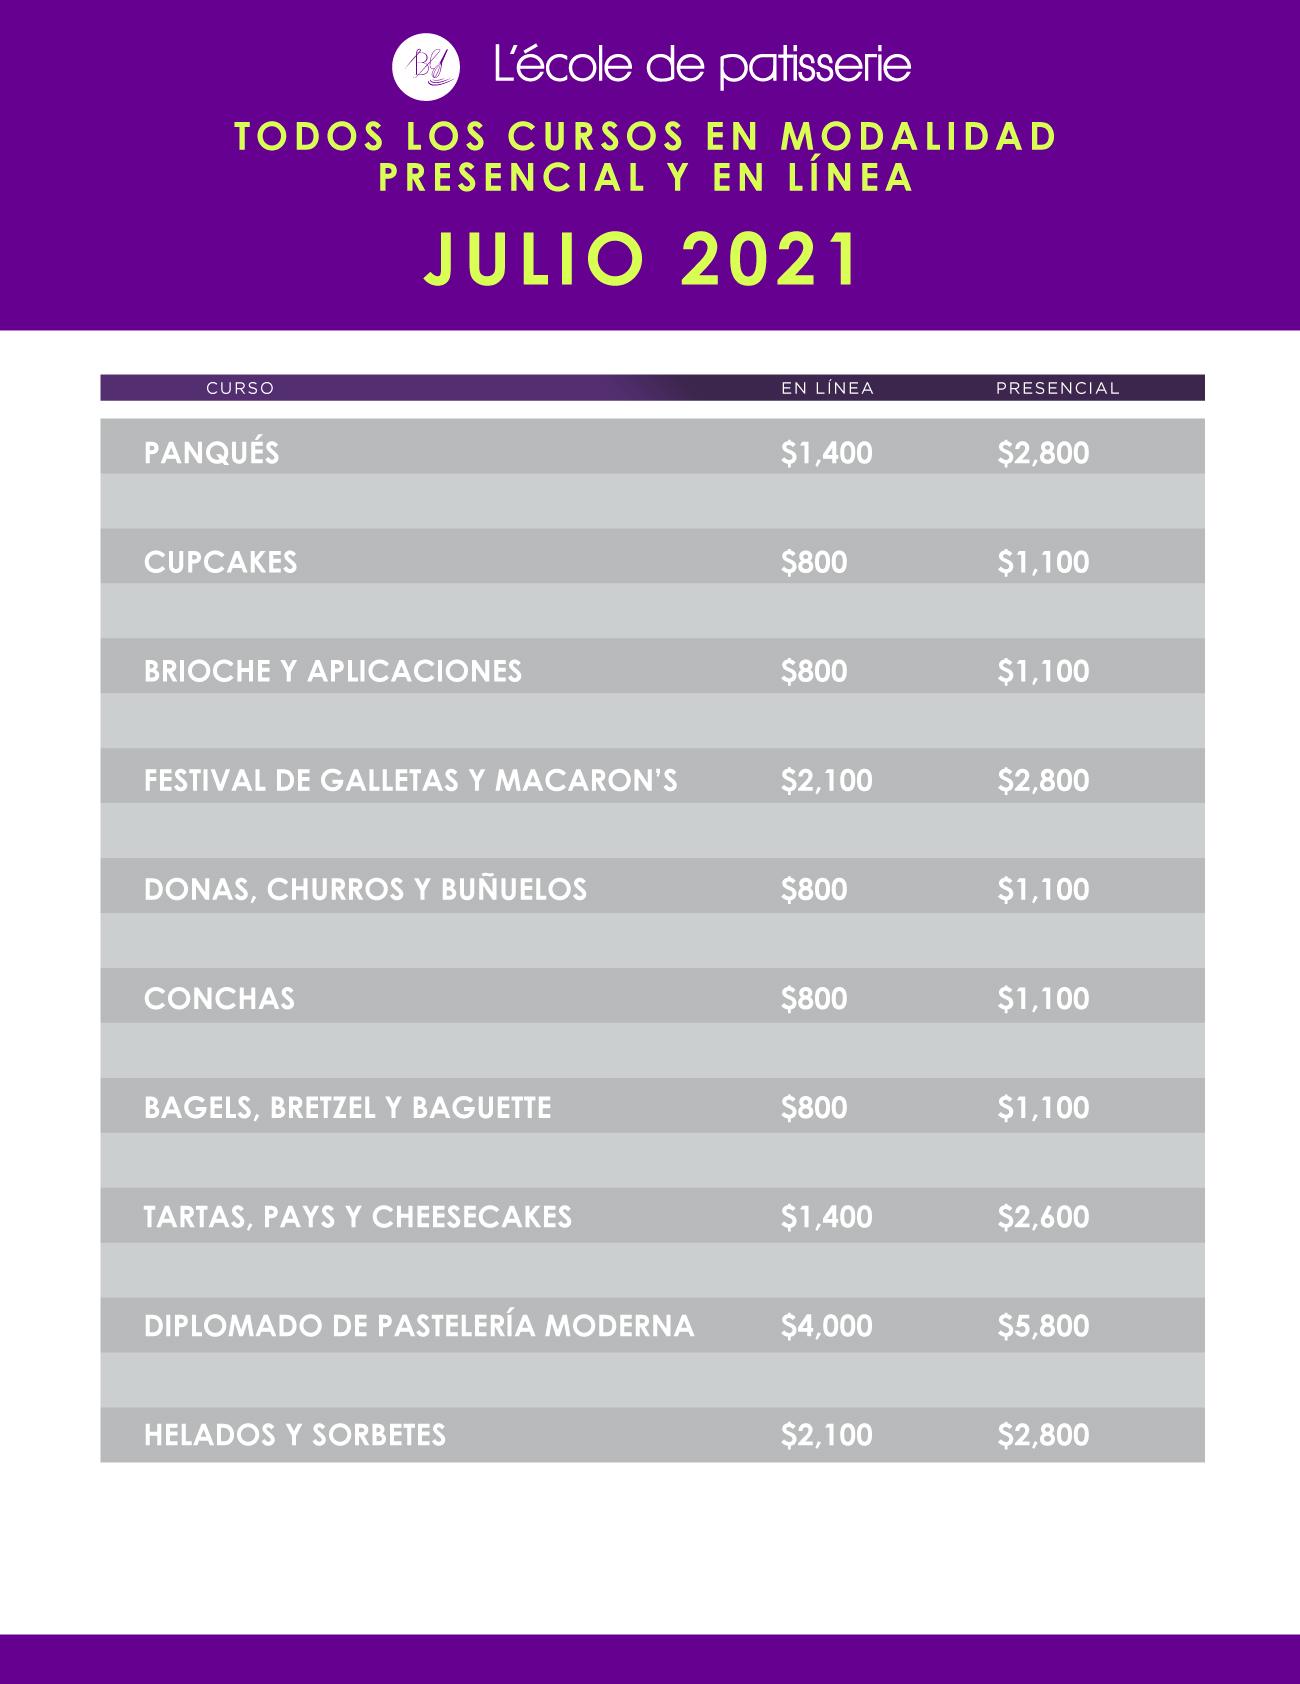 LEC_calendario0721-Precios